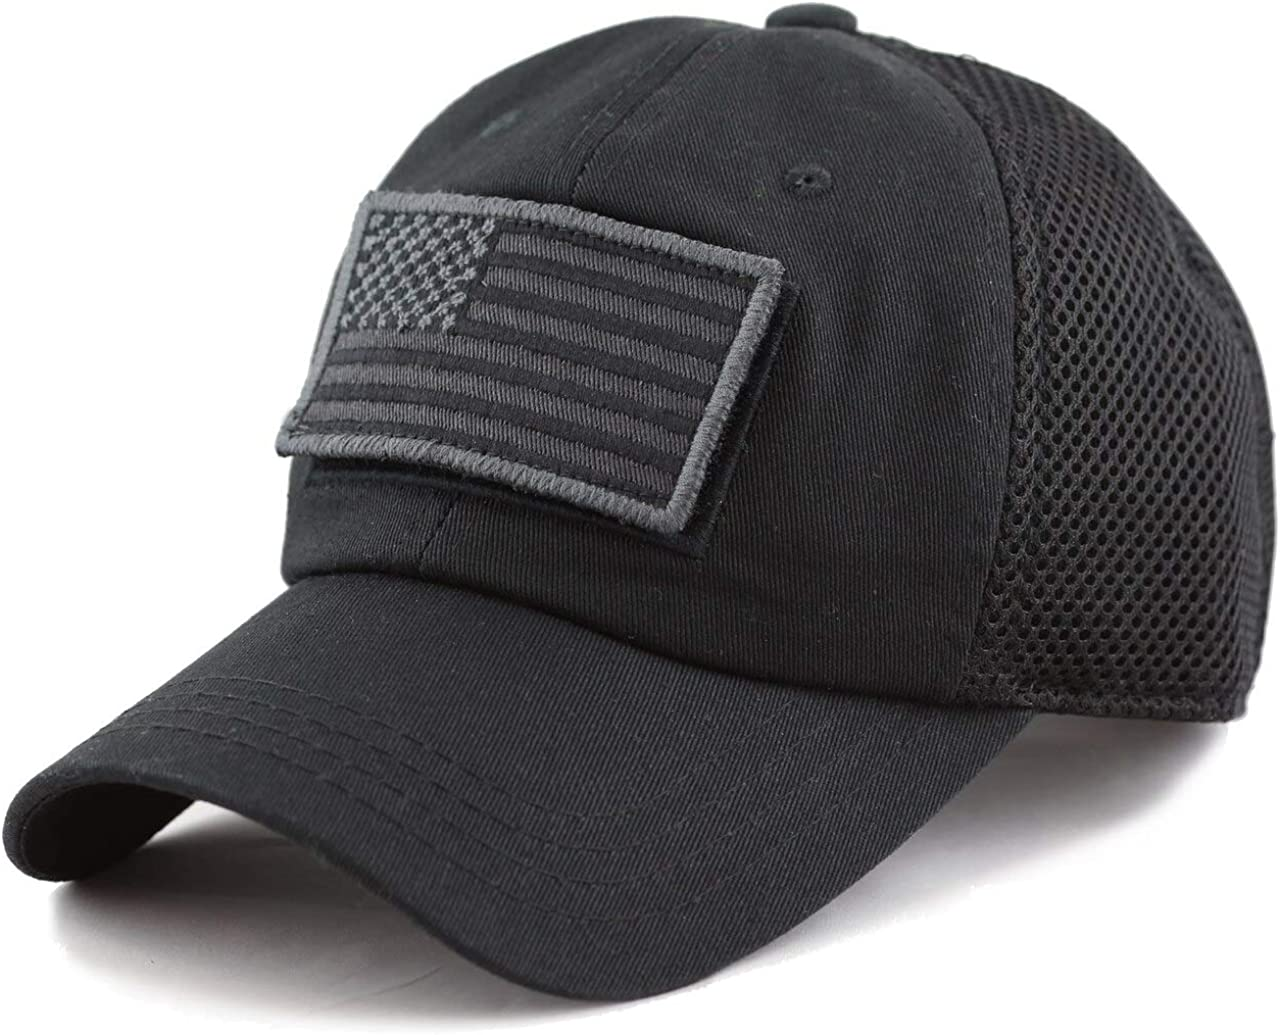 Pit Bull US Patch Adjustable Plain Trucker Hats Mu Baseball Gorgeous Sale special price Cap